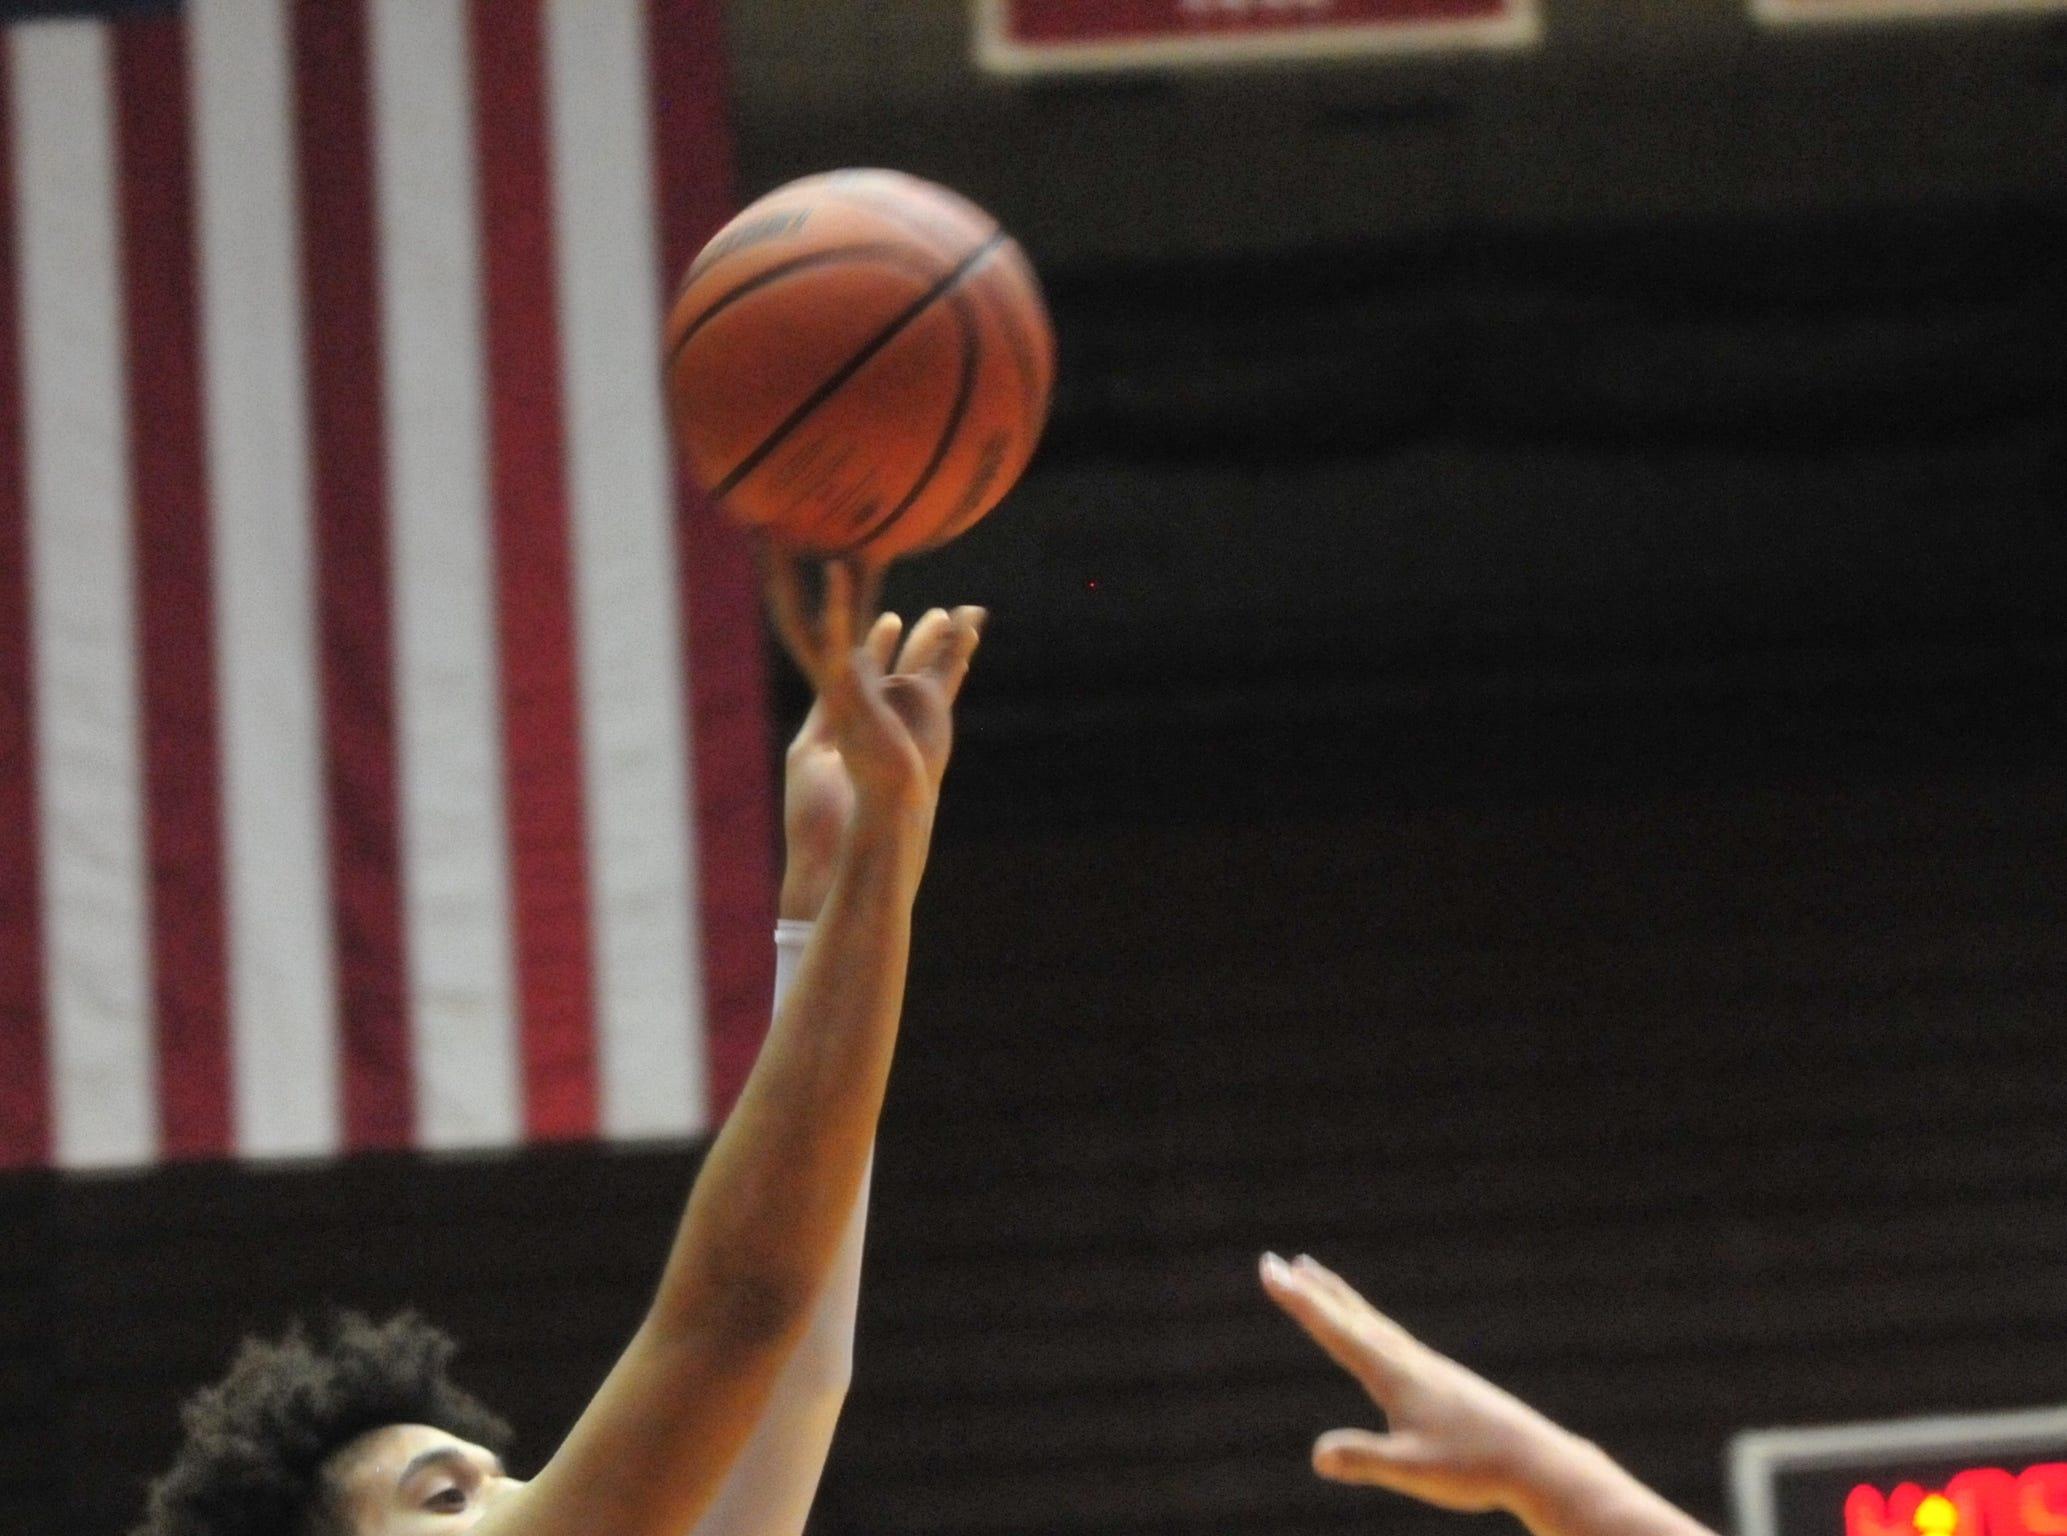 Richmond High School senior Jordan Frye takes a shot during a boys basketball game against Jay County Saturday, Nov. 24, 2018 at Richmond High School's Tiernan Center.